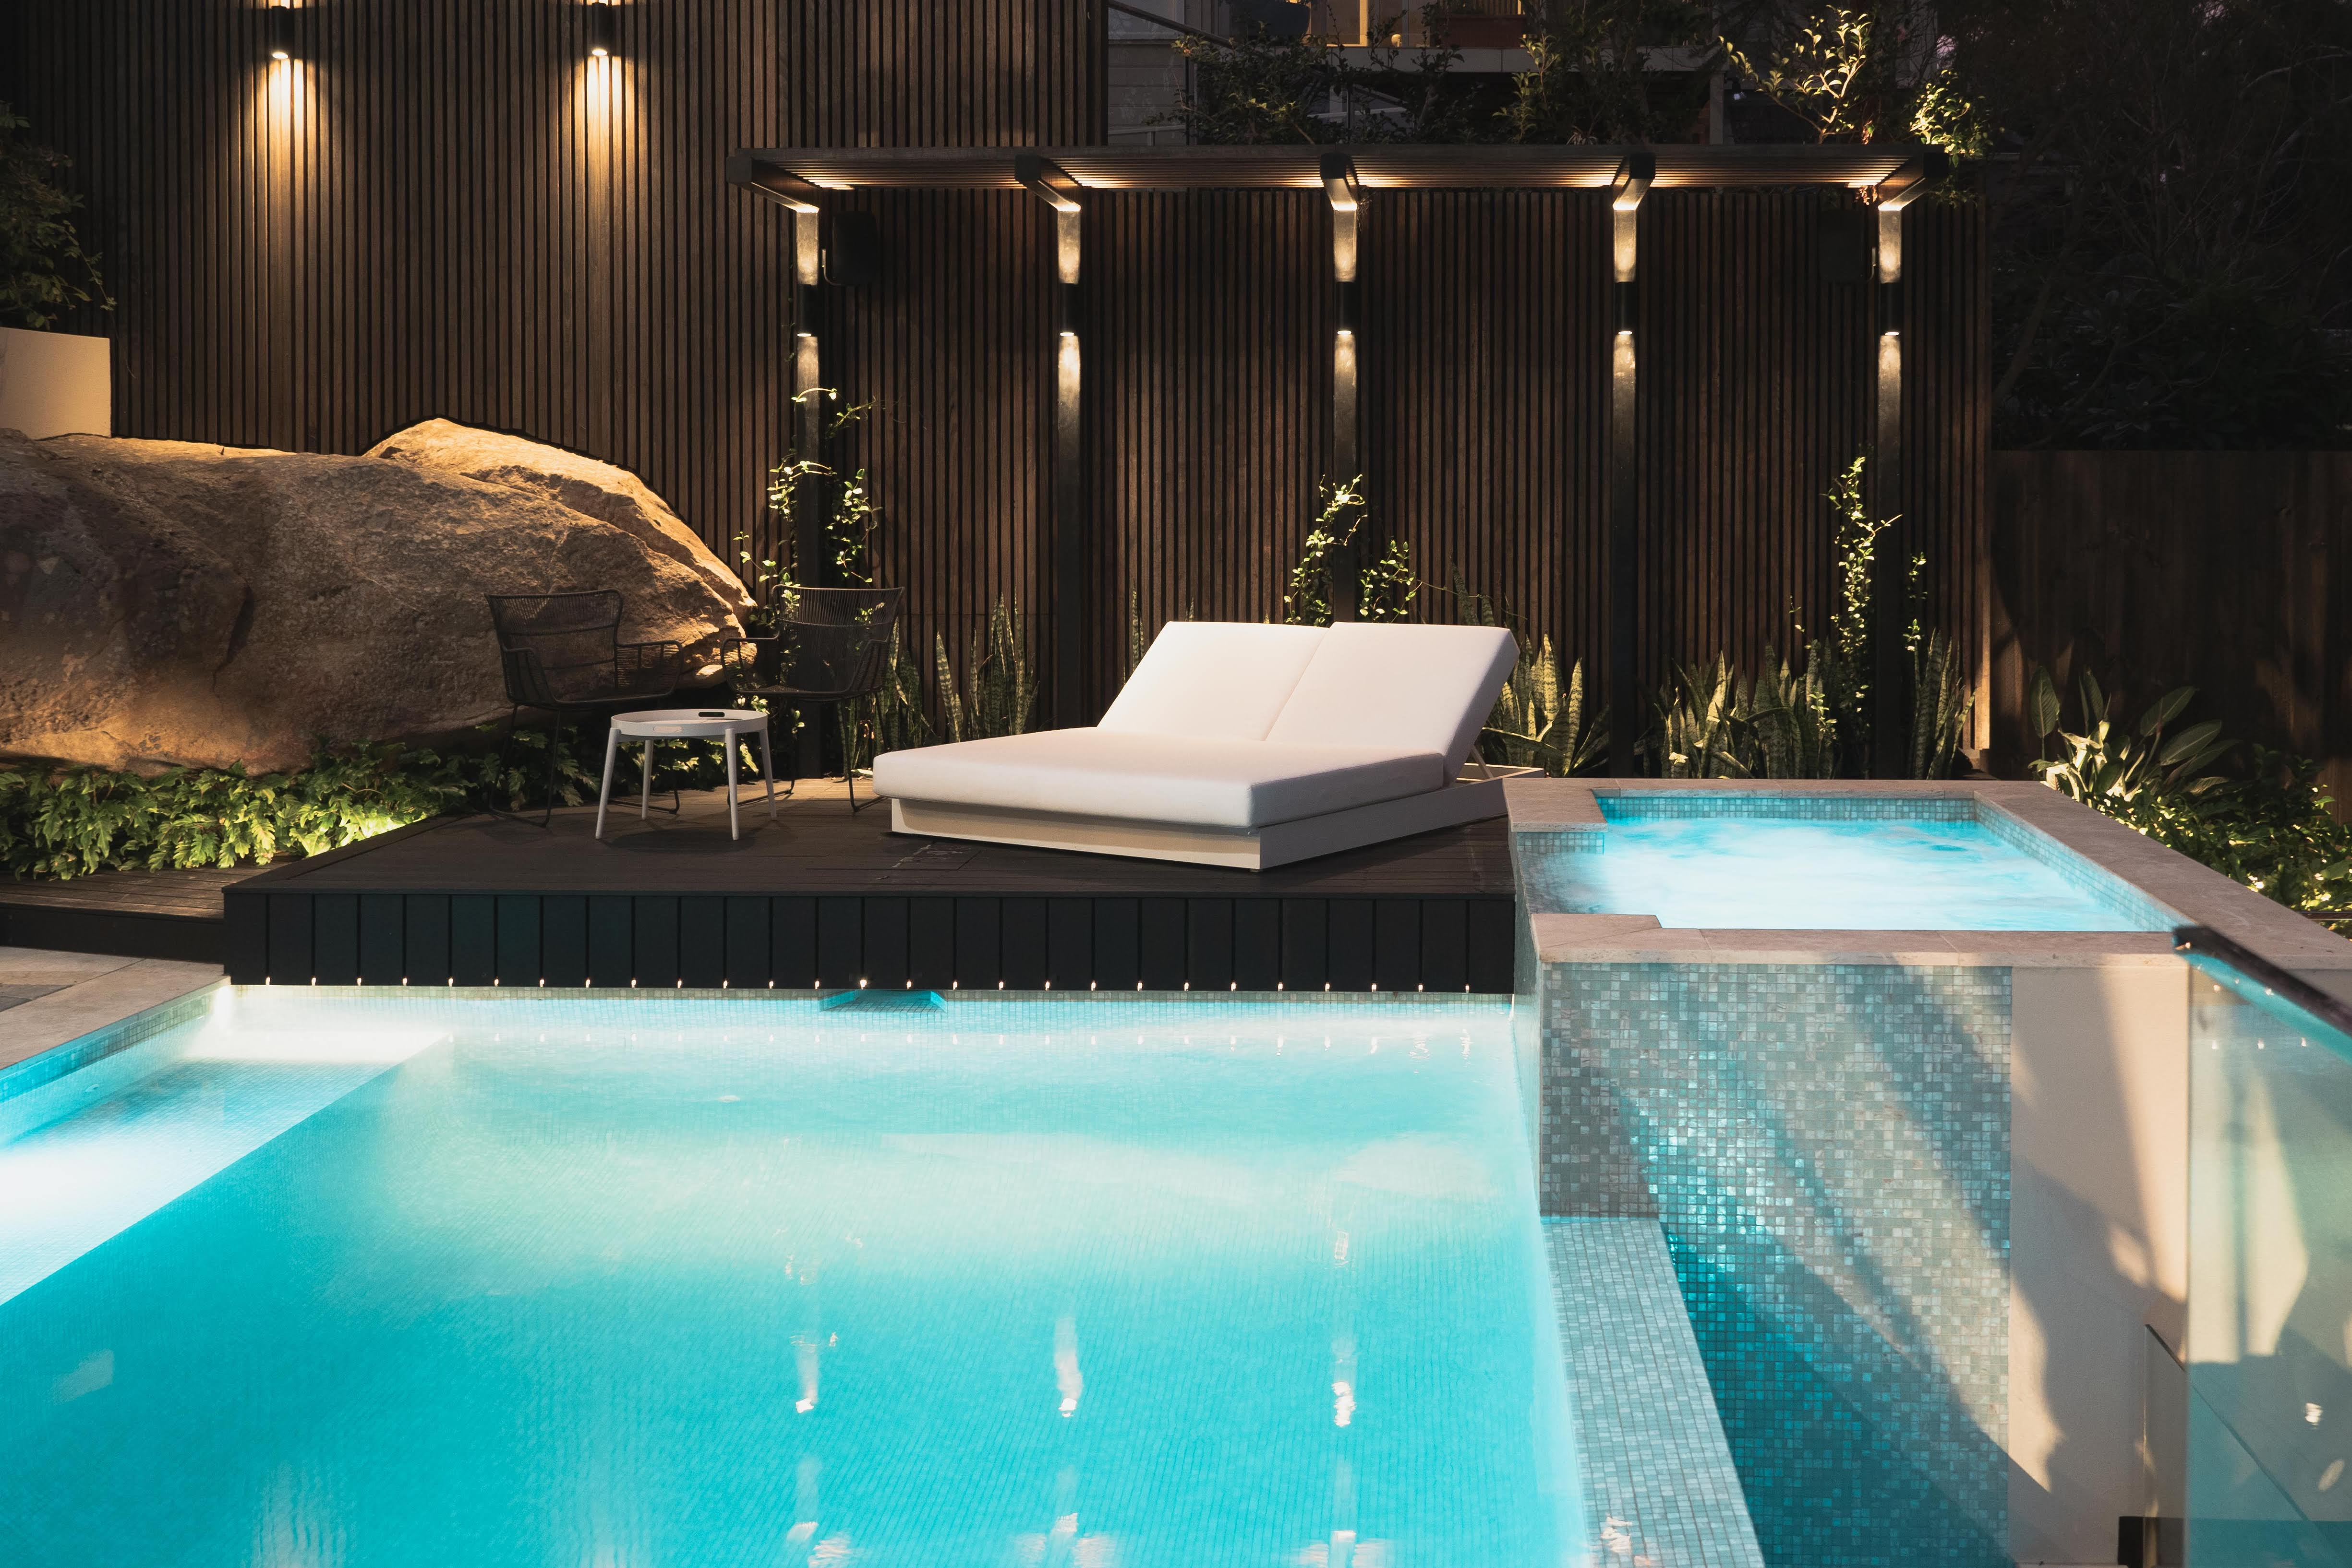 Pool renovation Sydney